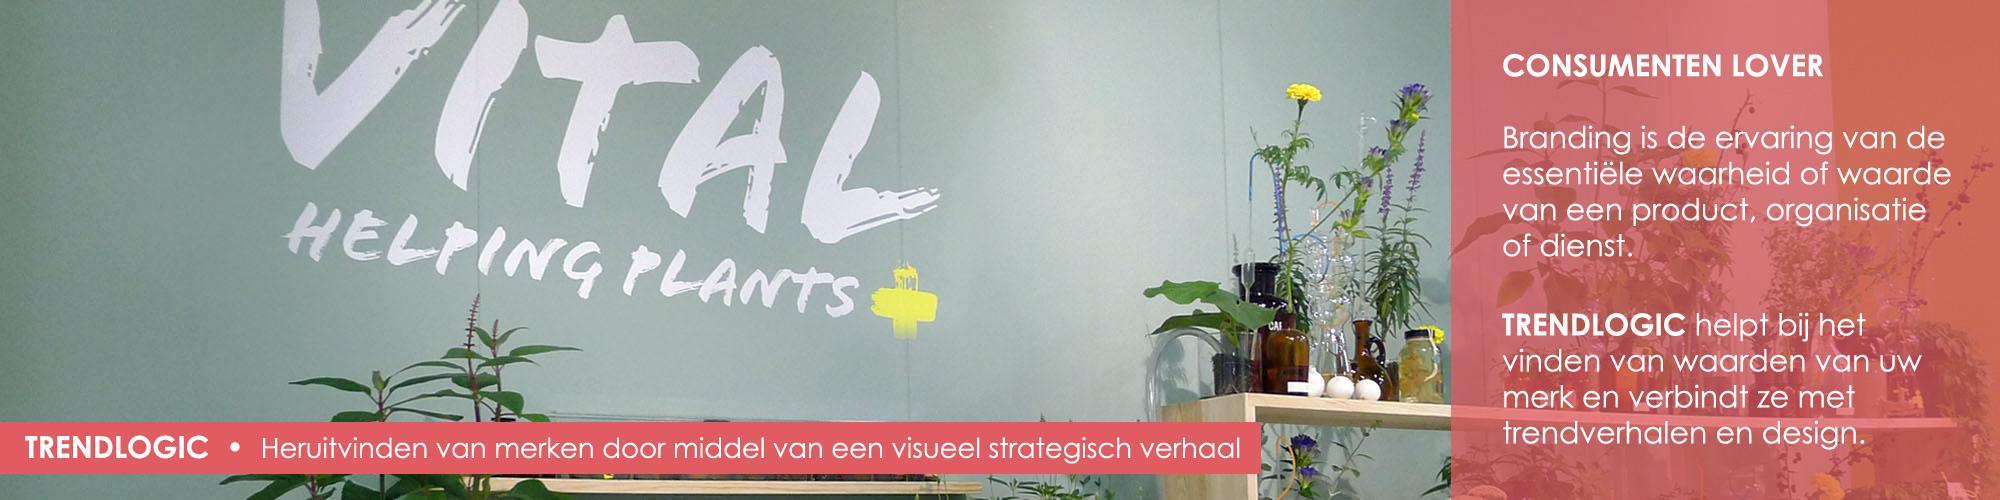 <a href='http://trendlogic.nl/nl/vital-fit-all-nl/'></a>